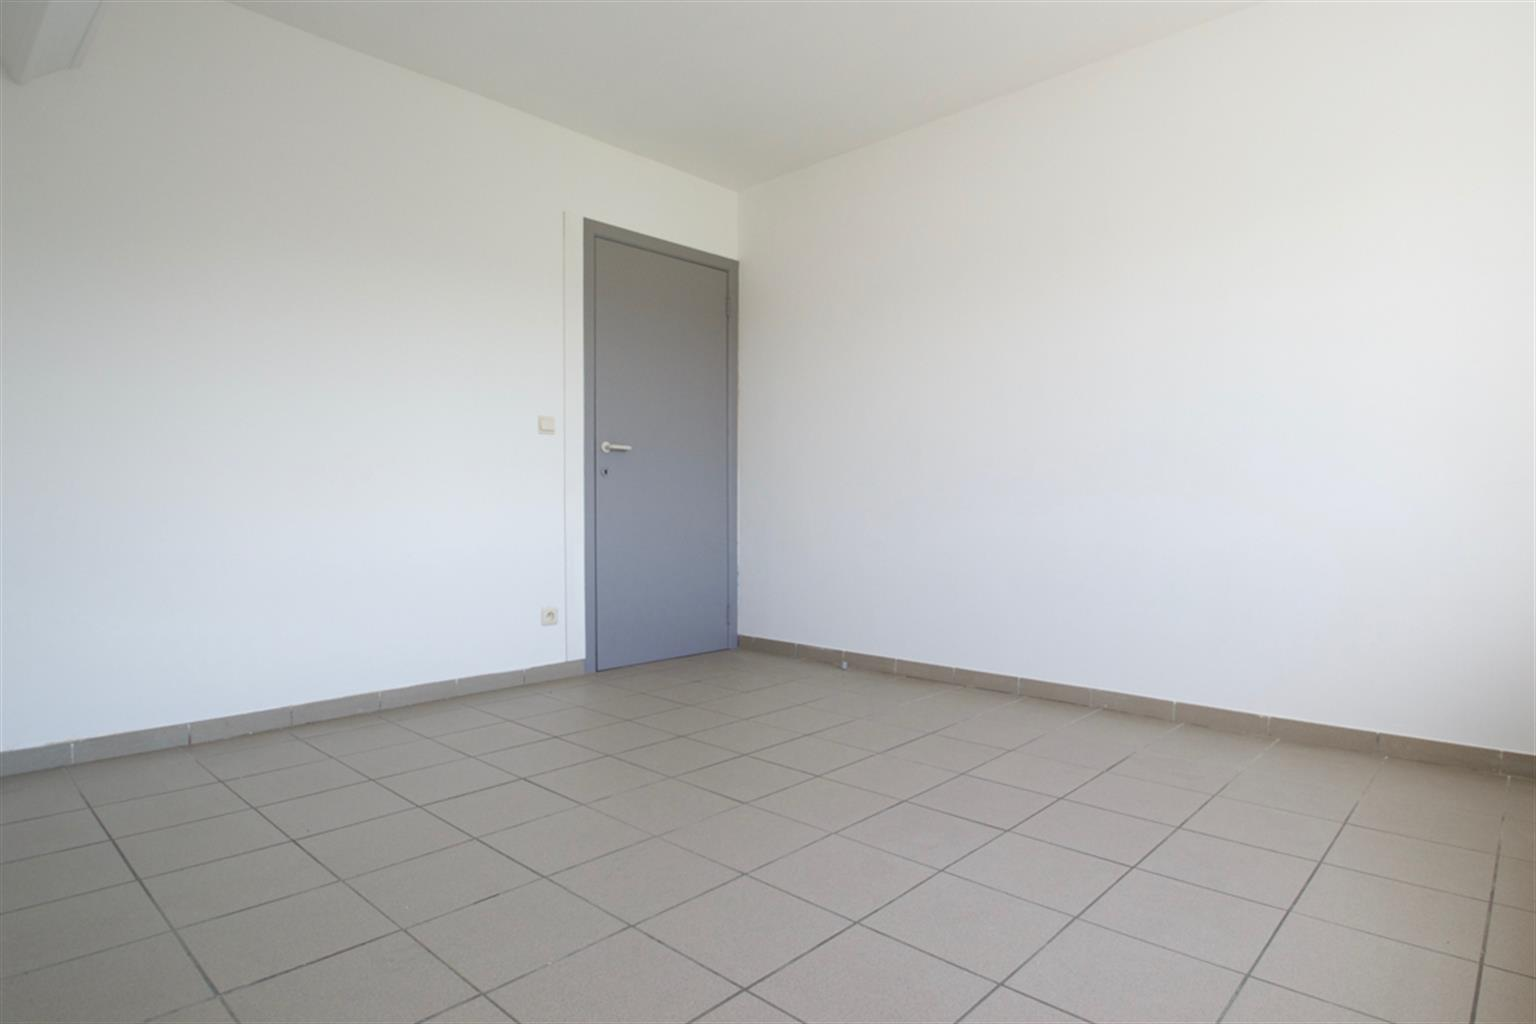 Appartement - Leval-Trahegnies - #3988340-2